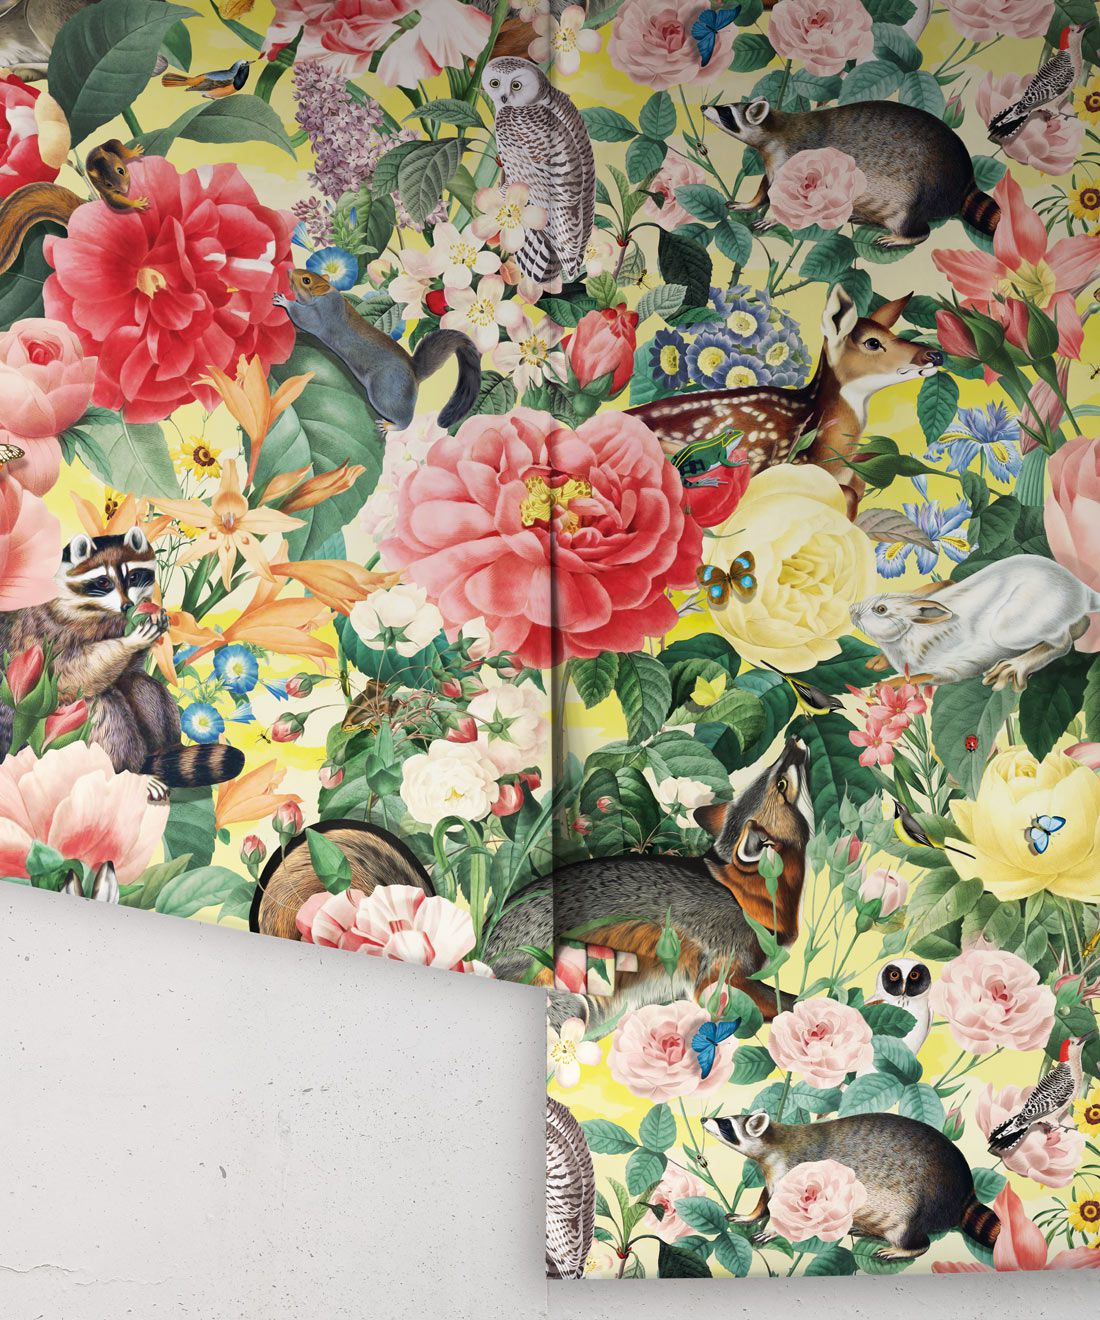 Bush Bouquet Spring Wallpaper • Lemon Colored Wallpaper • Assorted Color and Multi-color wallpaper • Floral Wallpaper • Wallpaper With Forest Animals • Rolls